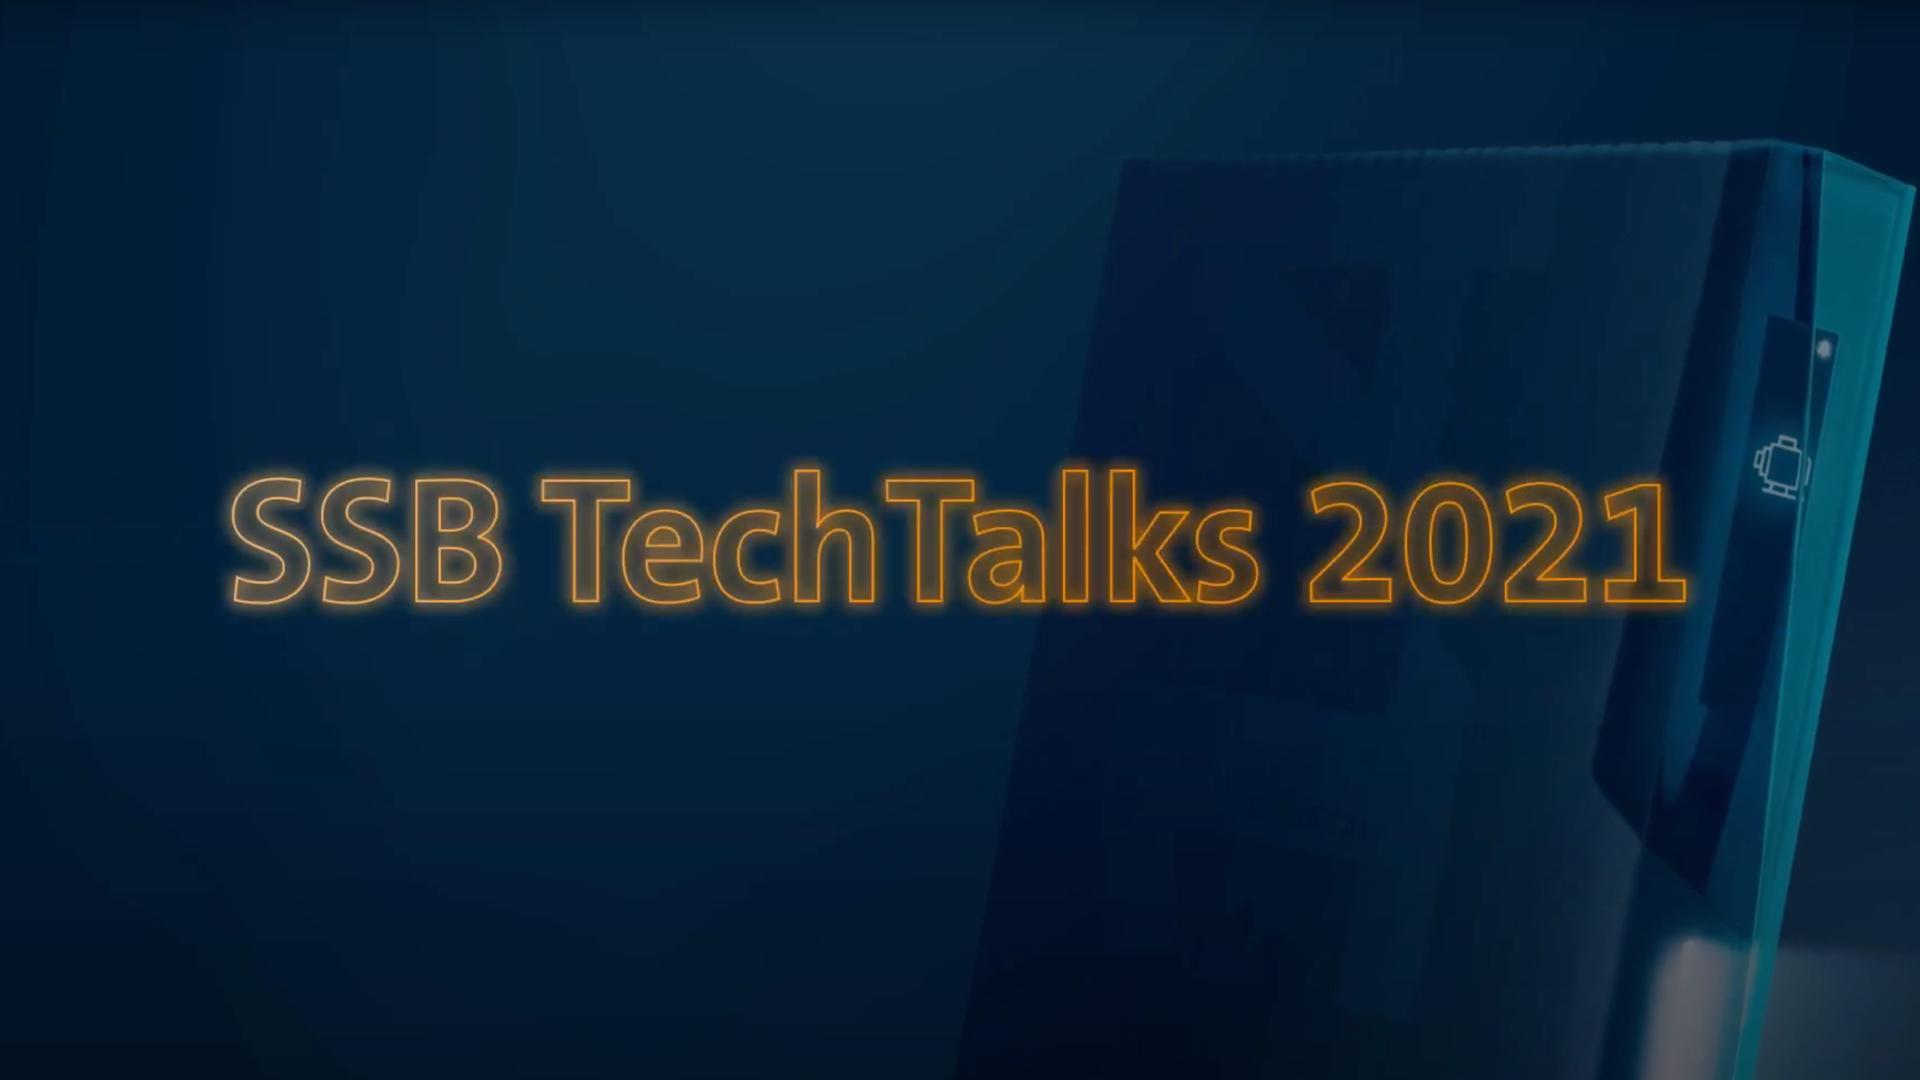 Tech talk motus c14 thumbnail